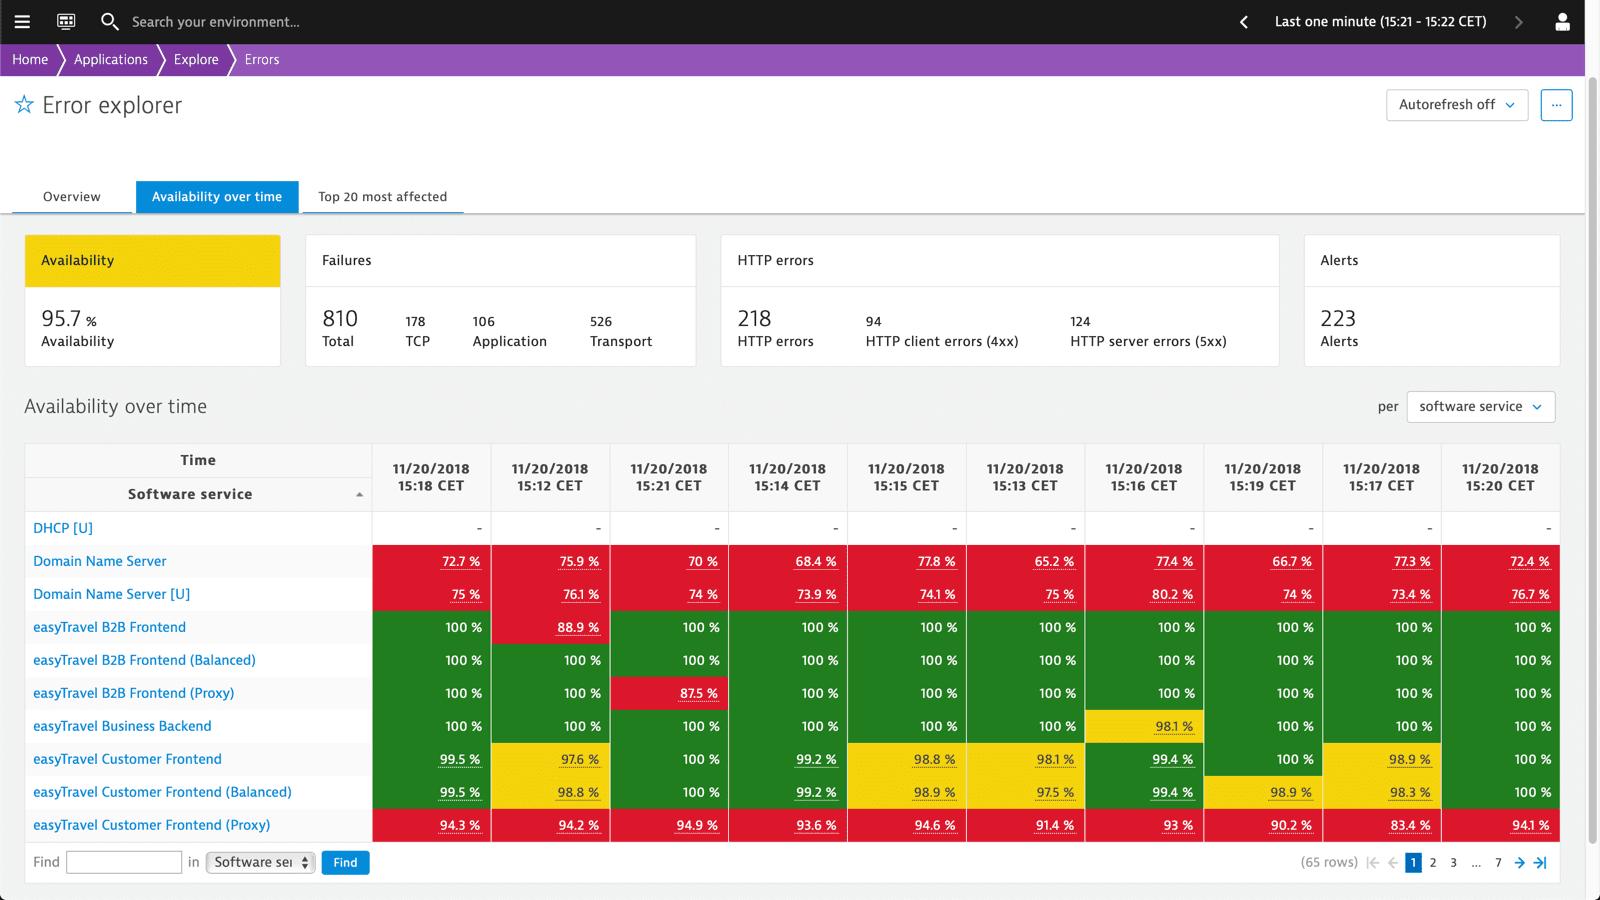 Error explorer: availability over time